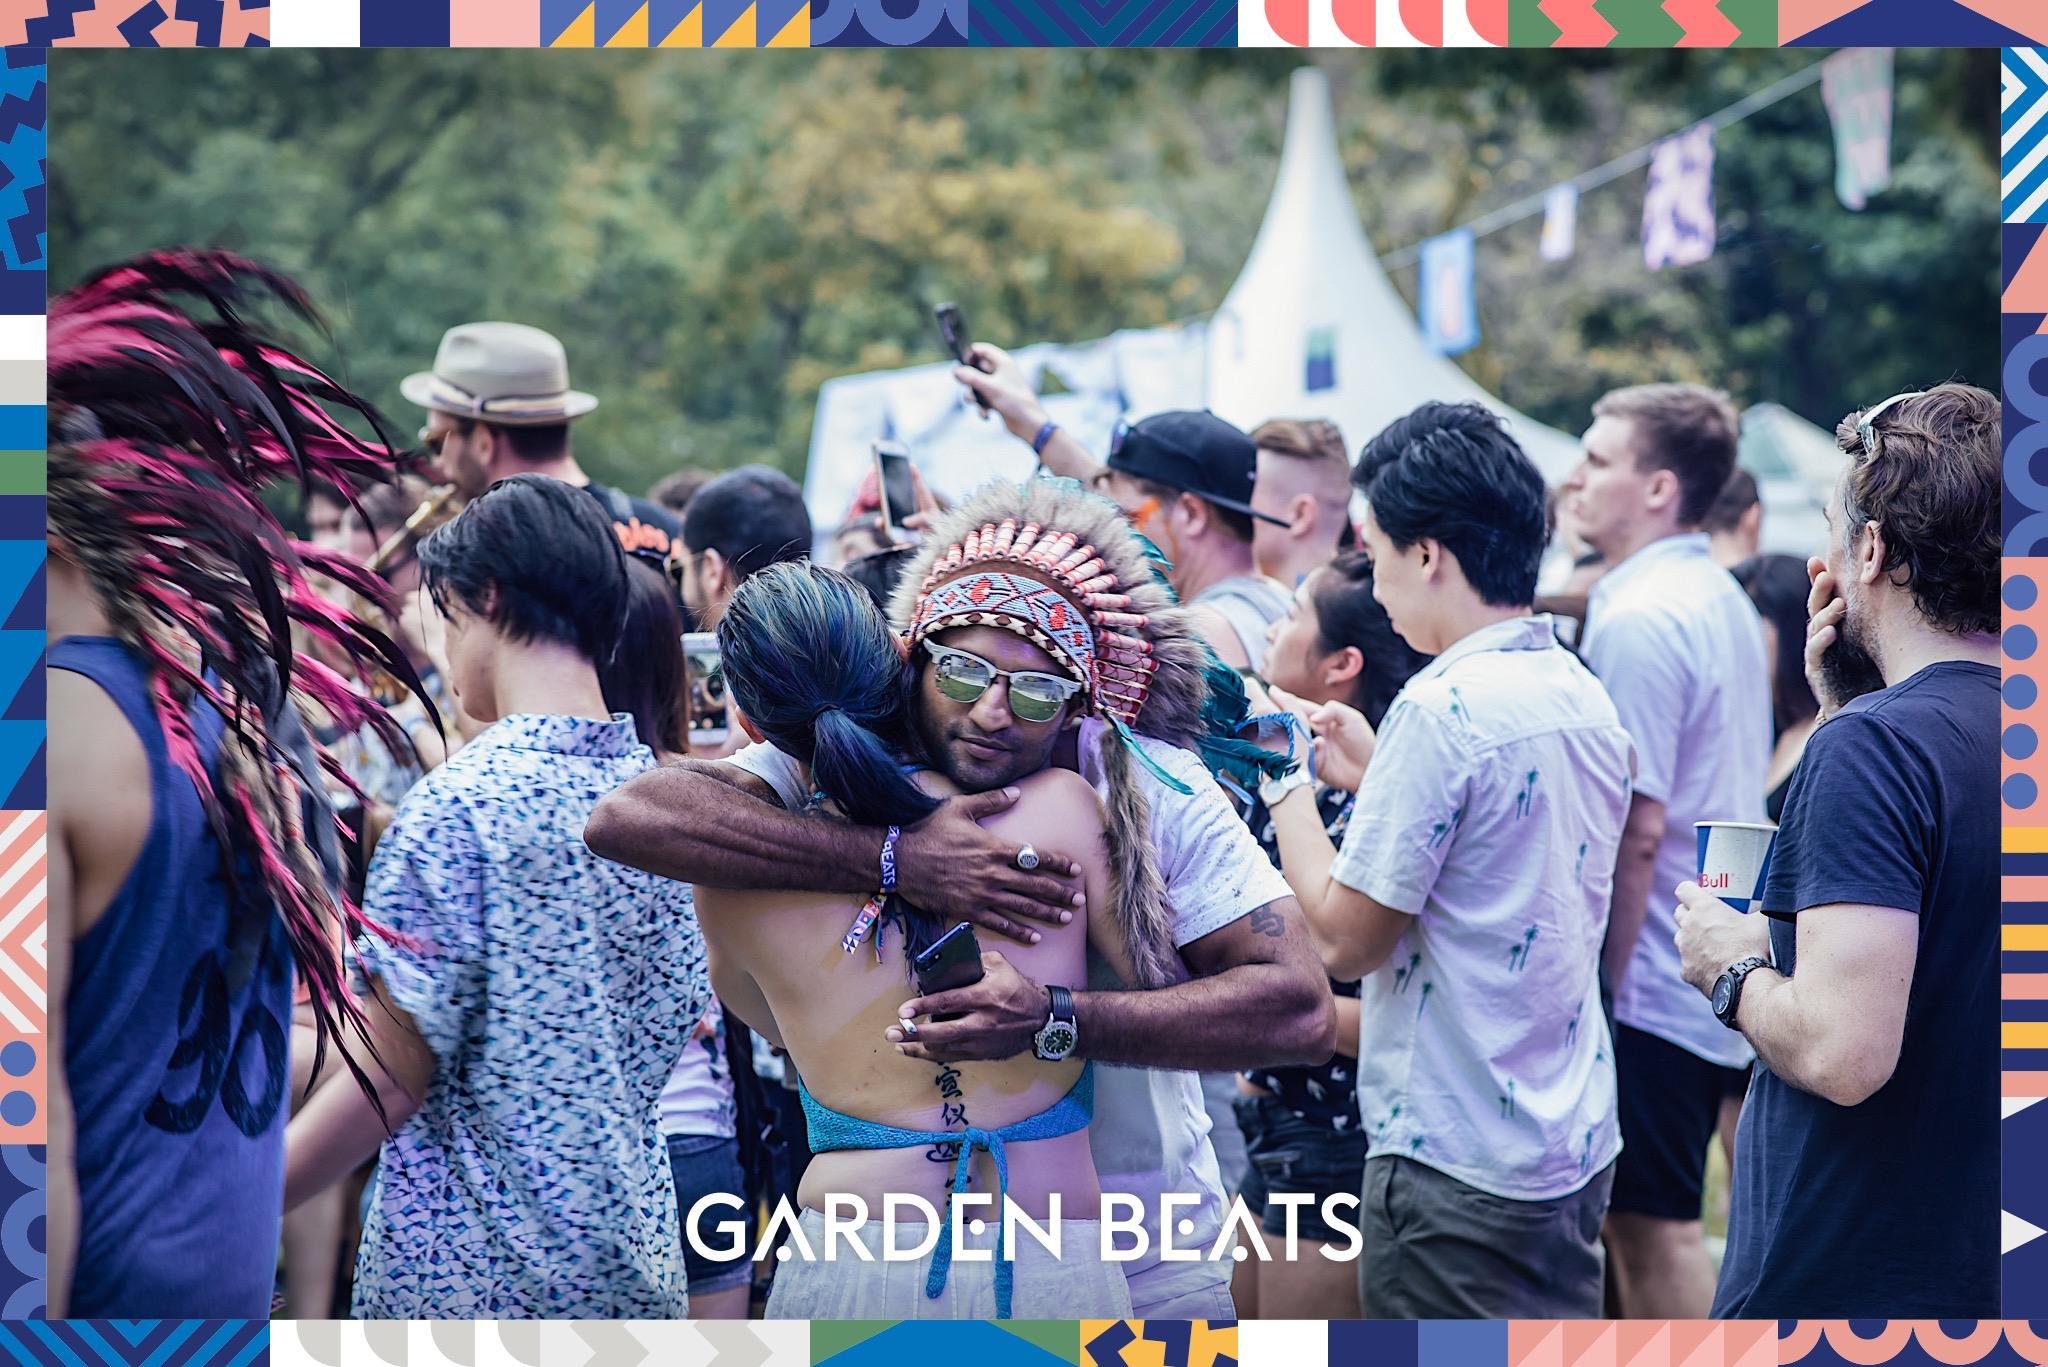 18032017_GardenBeats_Colossal621_WatermarkedGB.jpg